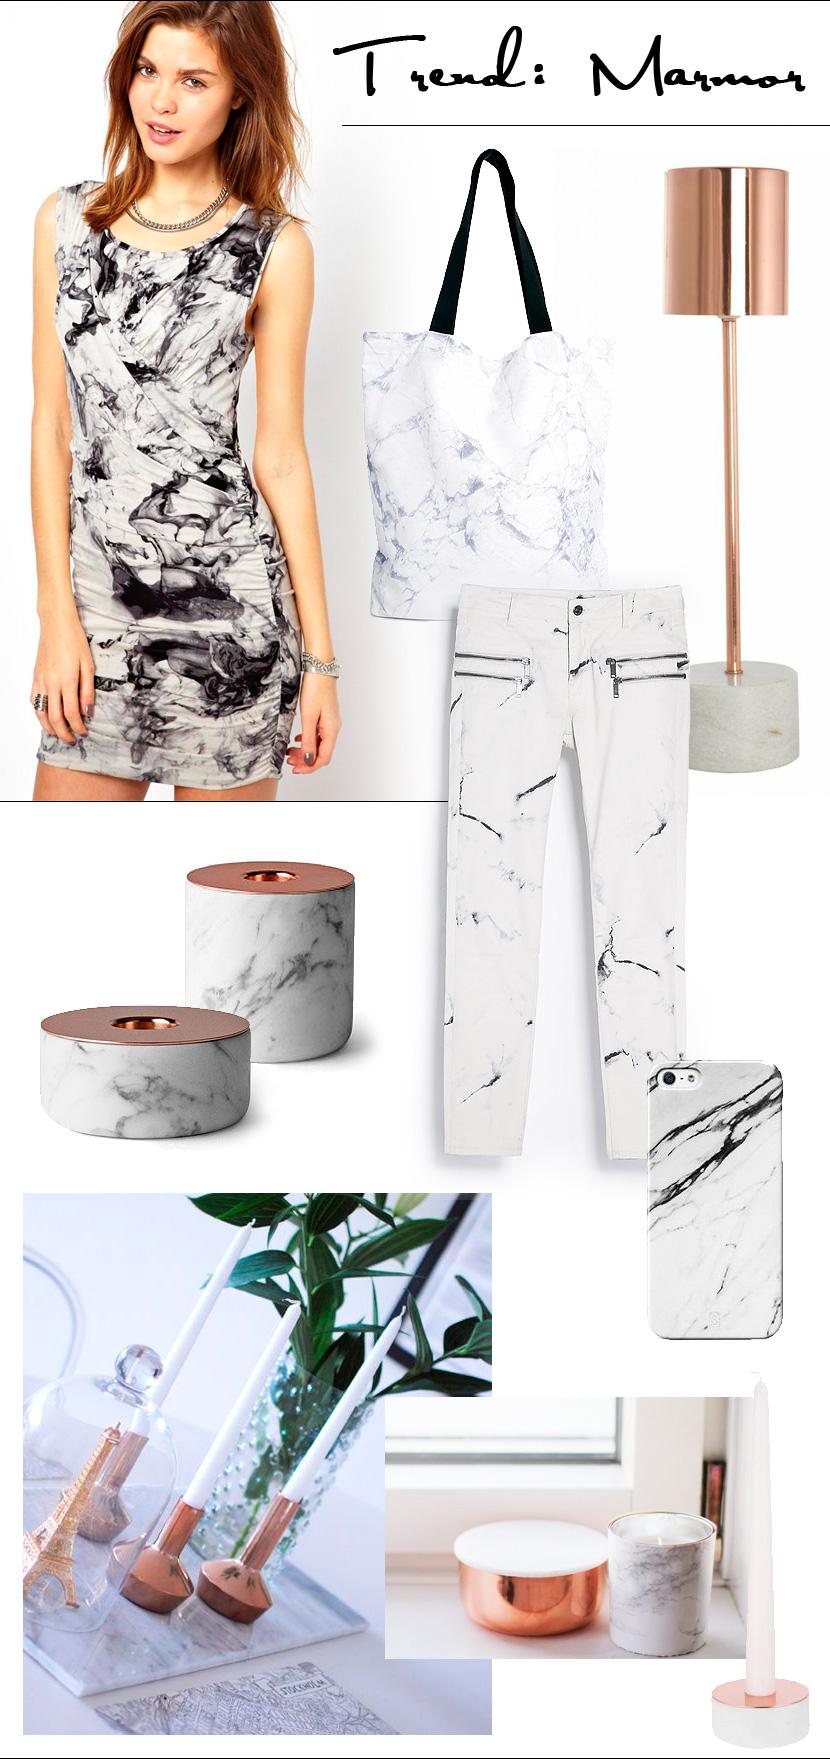 Beitrag_Collage-Marmor